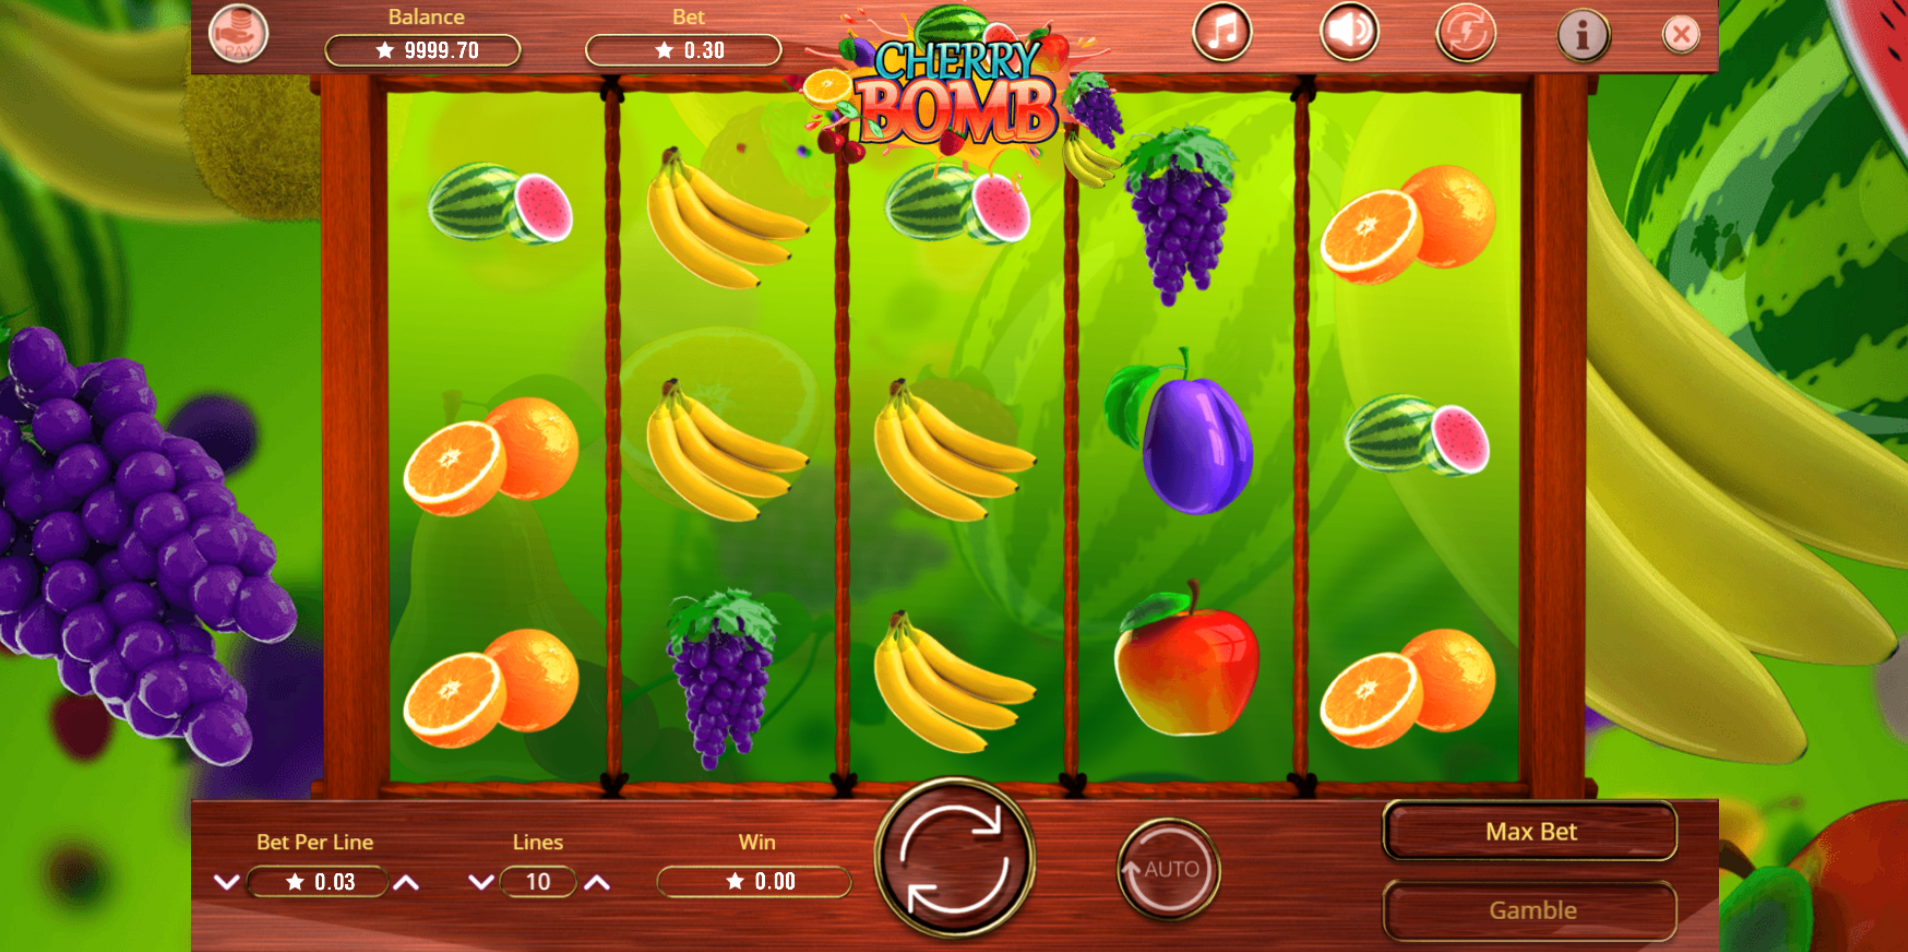 Lotus Love Slot Machine Online ᐈ Booming Games™ Casino Slots